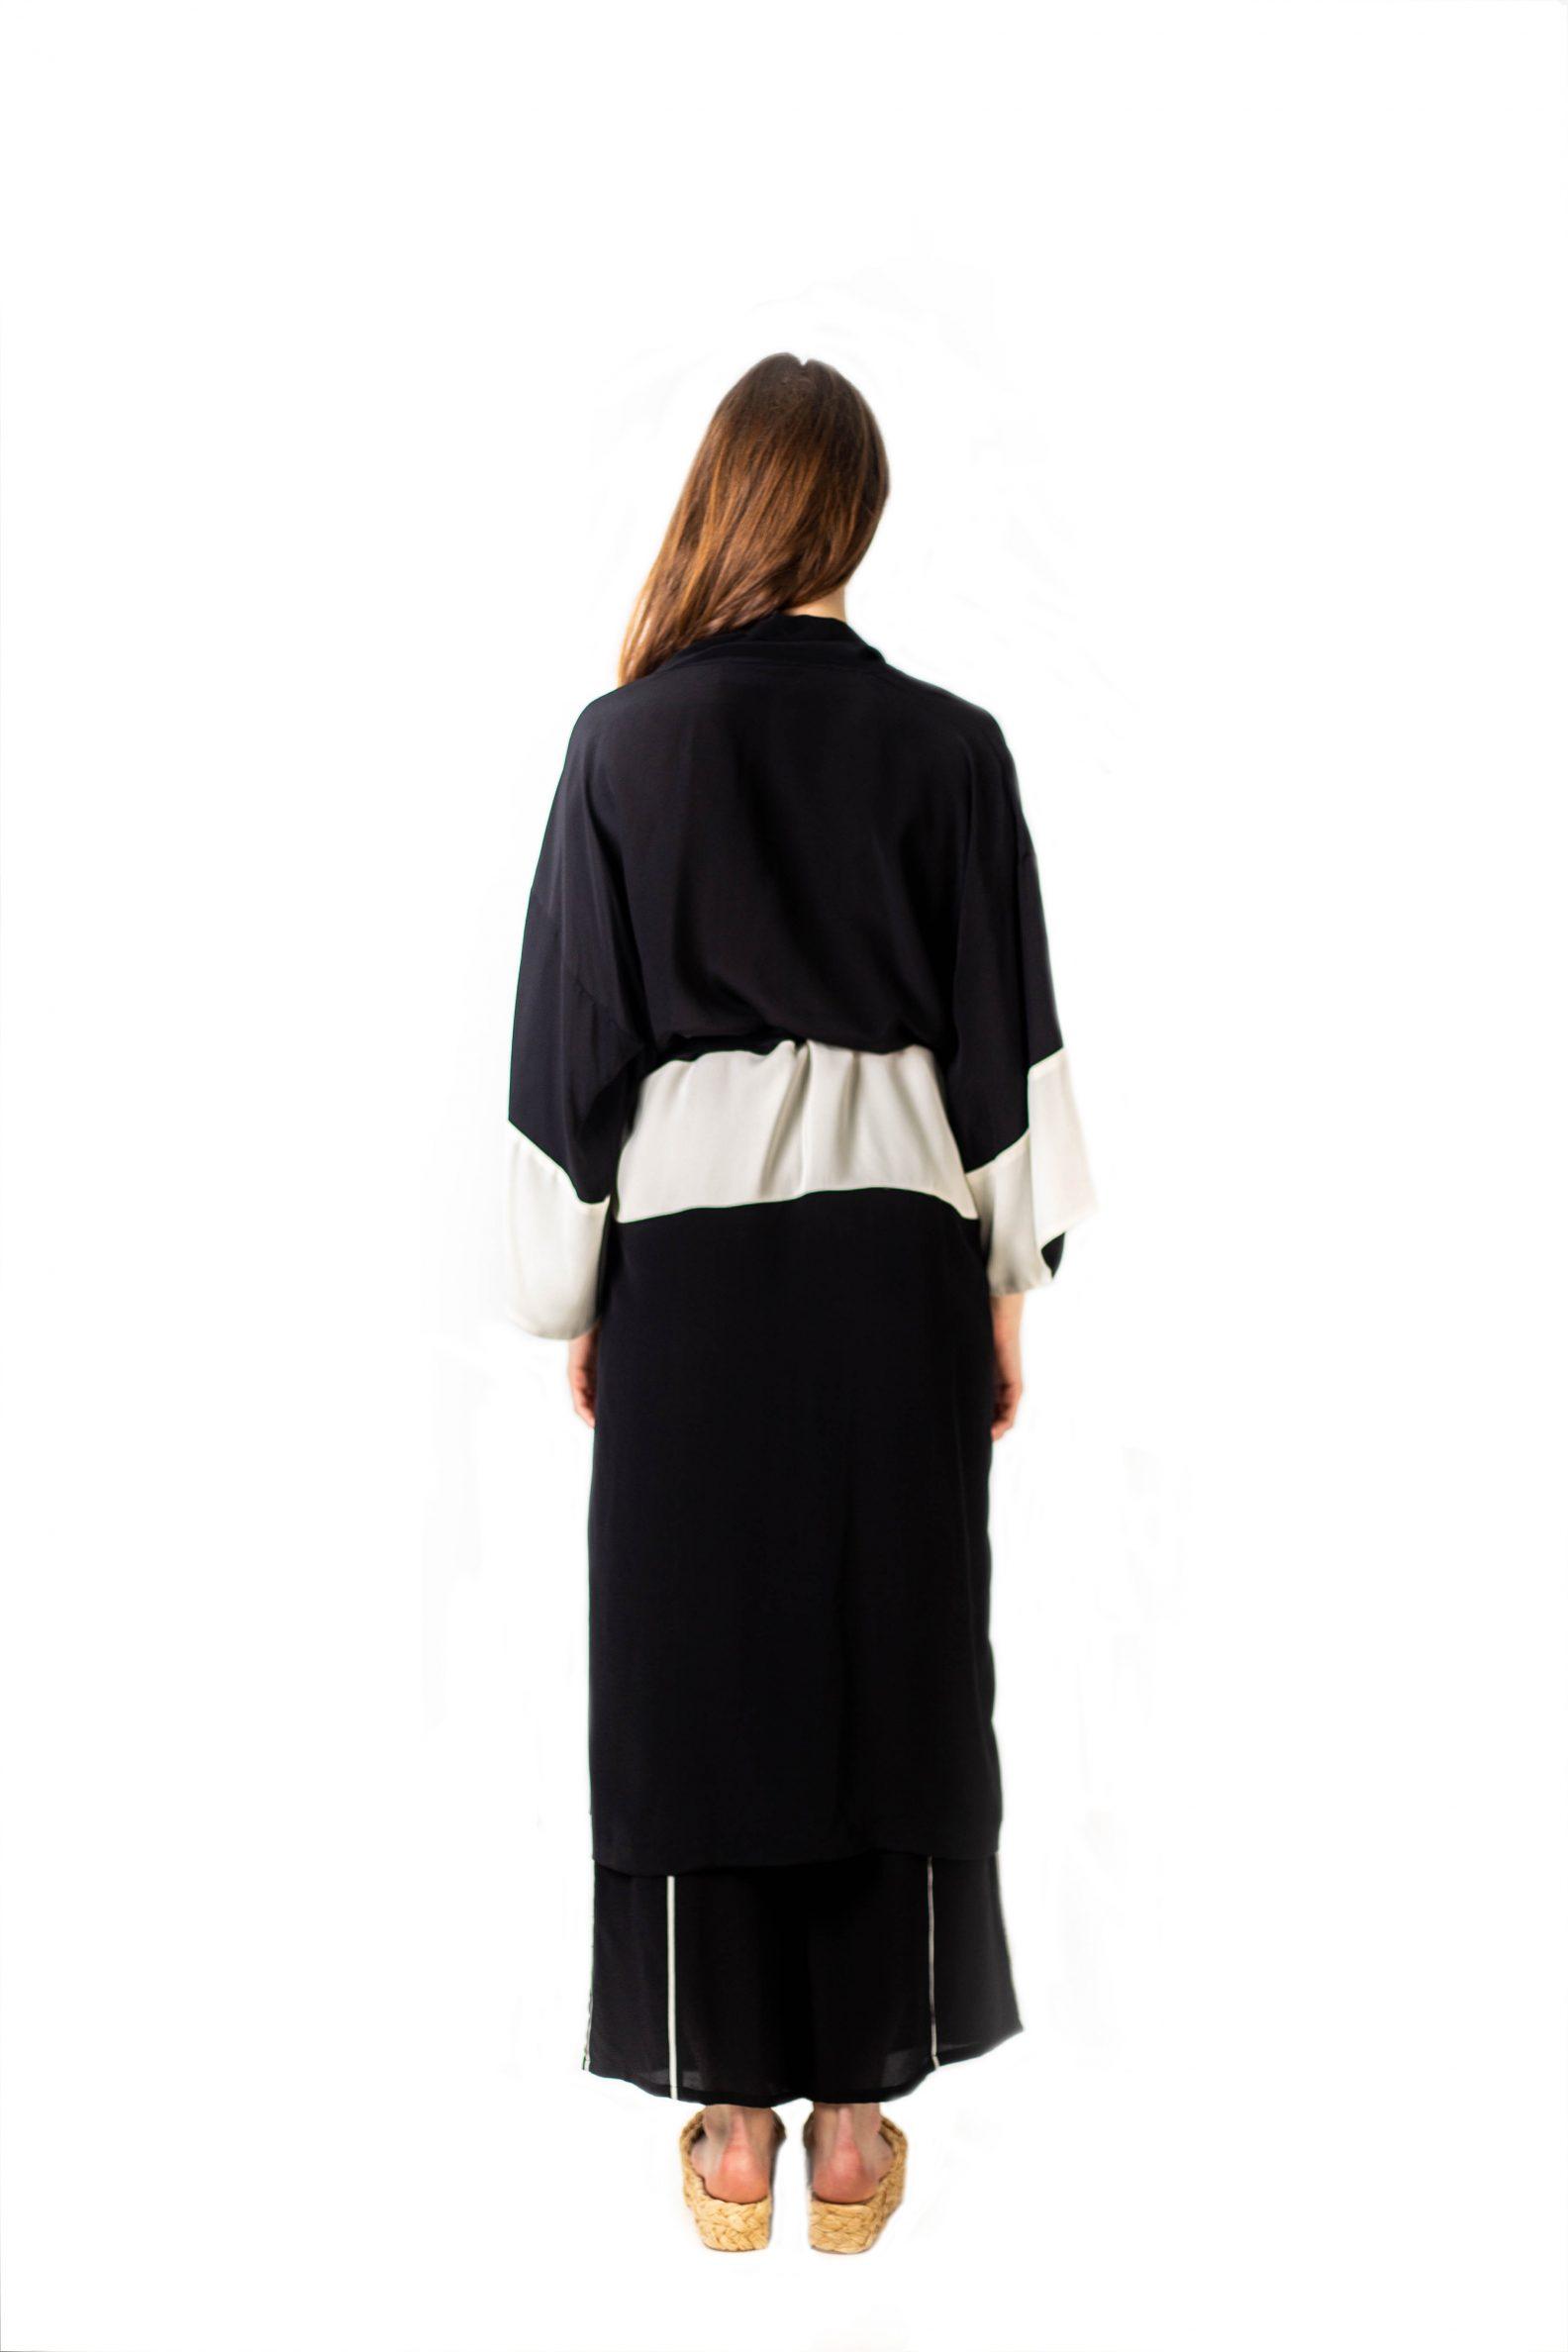 upcycling-kimono-long-crepe-soie-affaires-etrangeres-tremblepierre